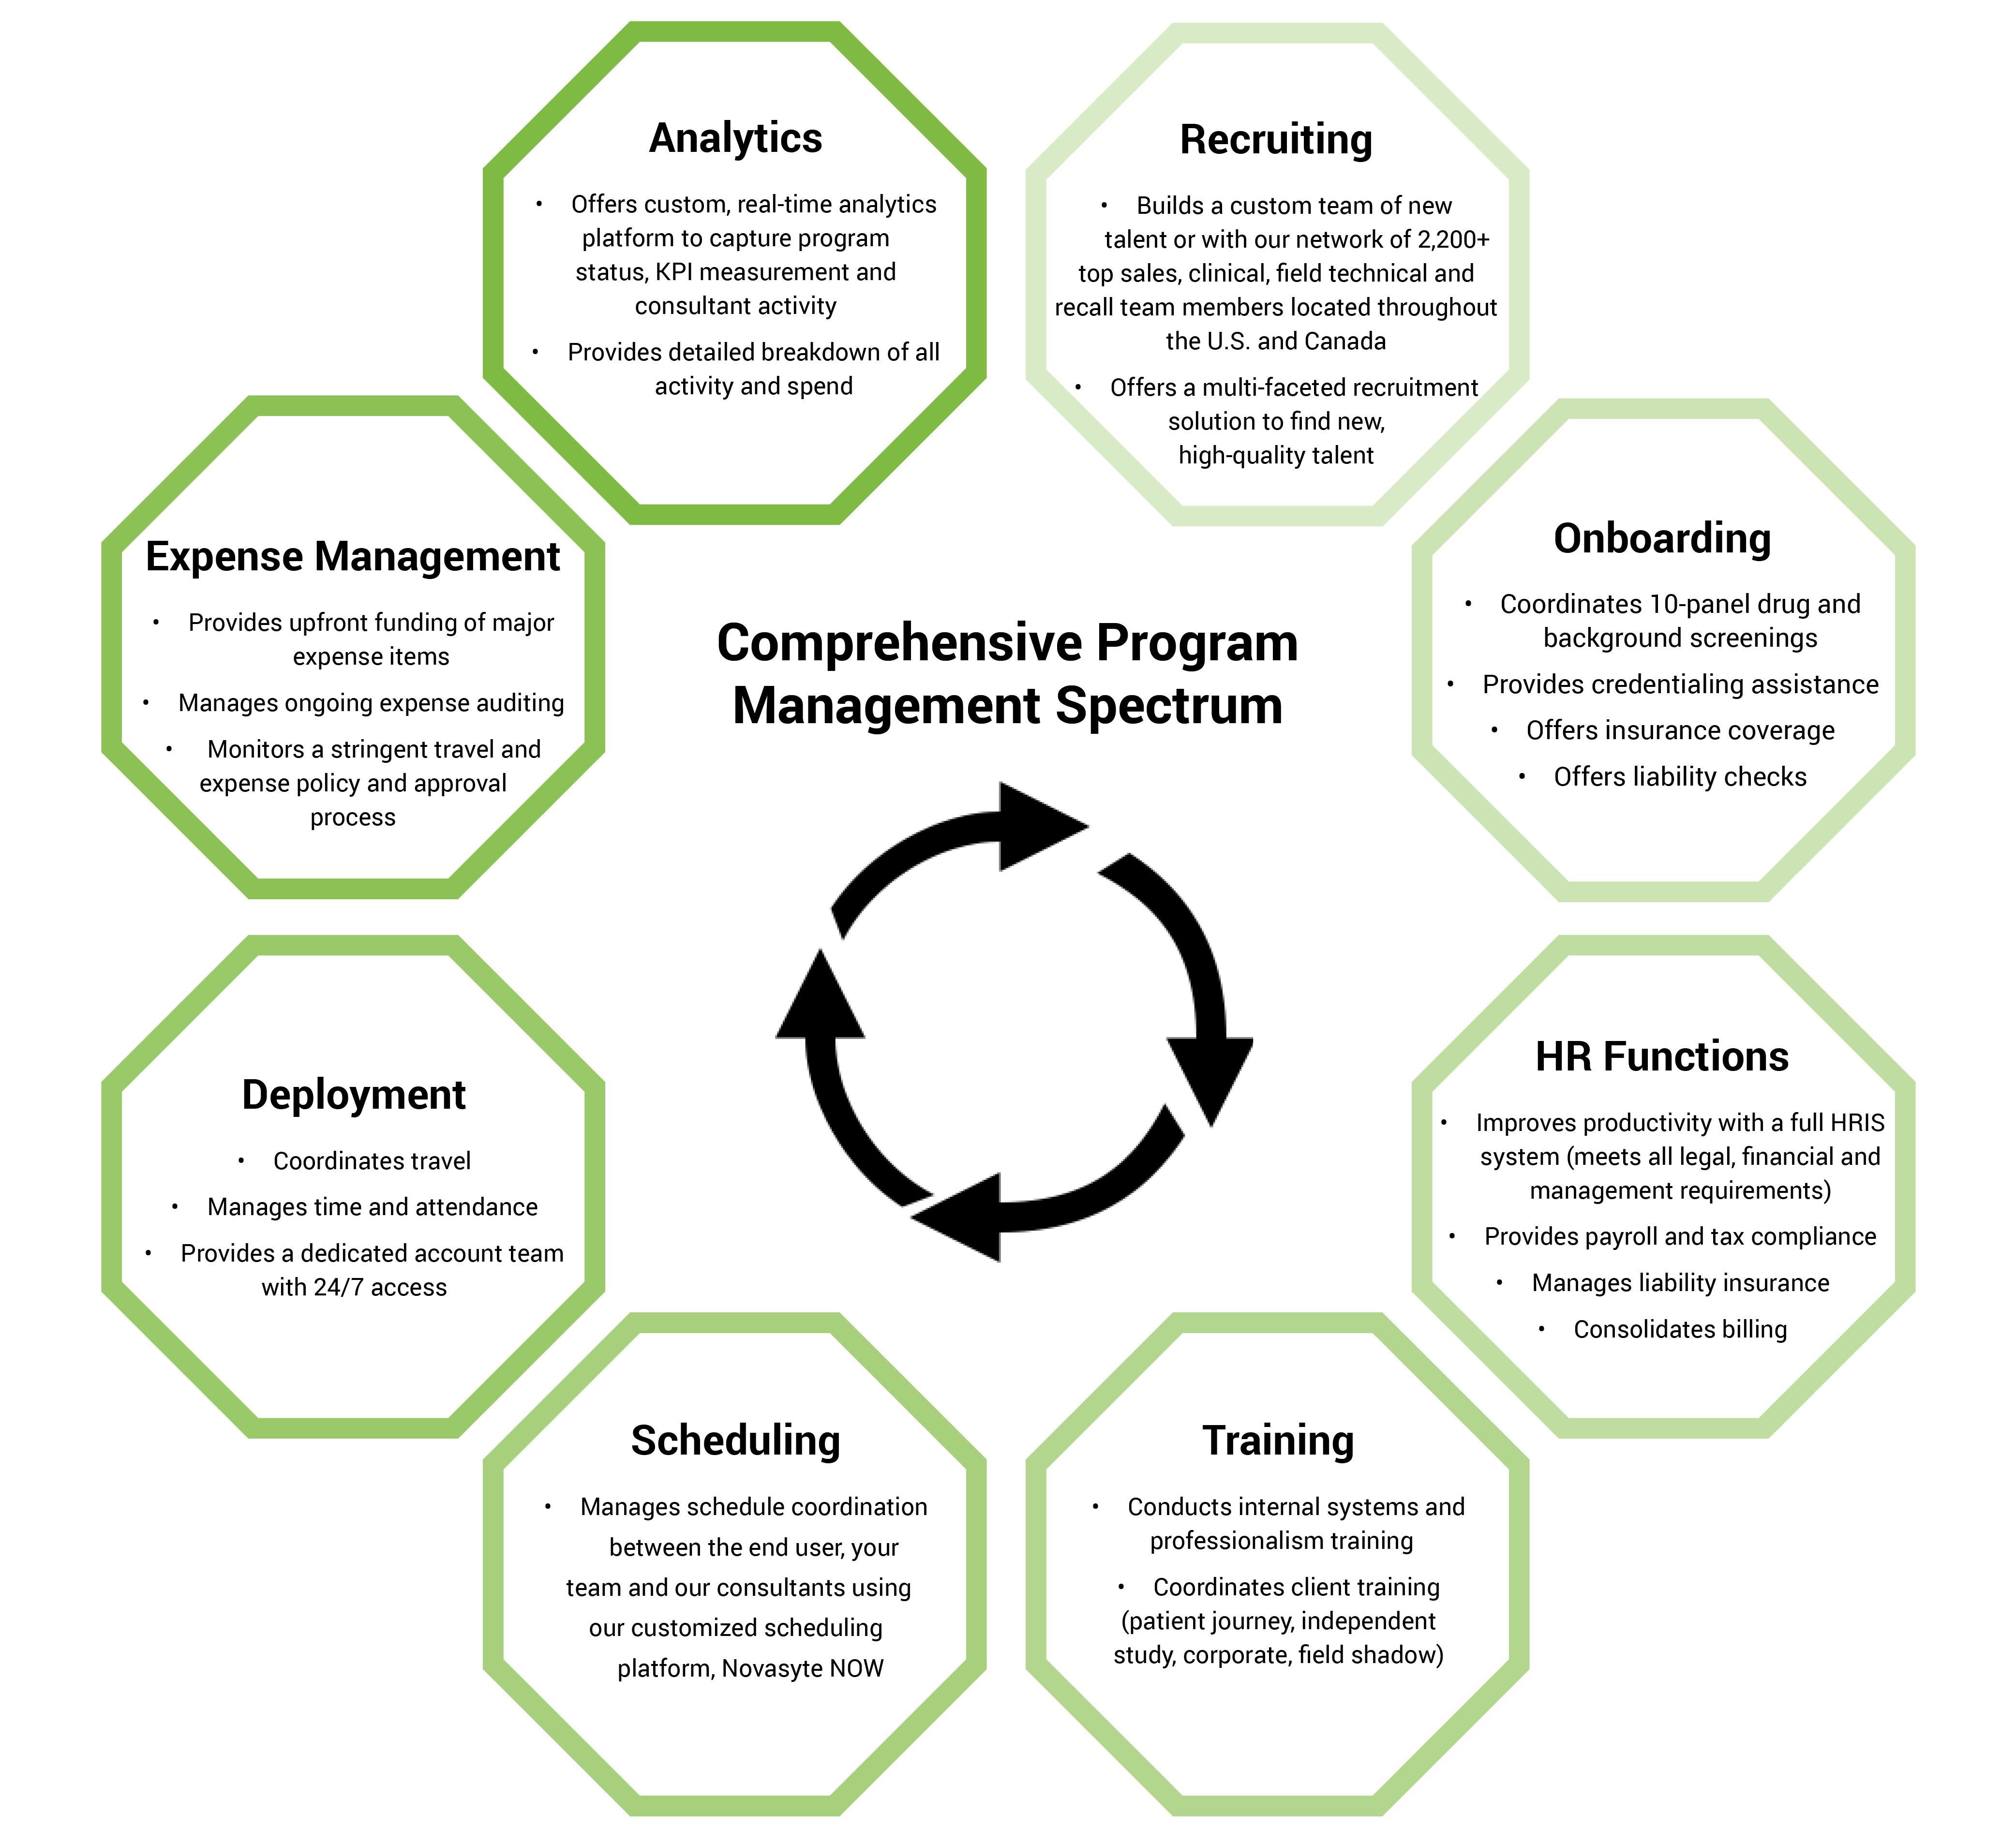 Comprehensive Program Management Spectrum